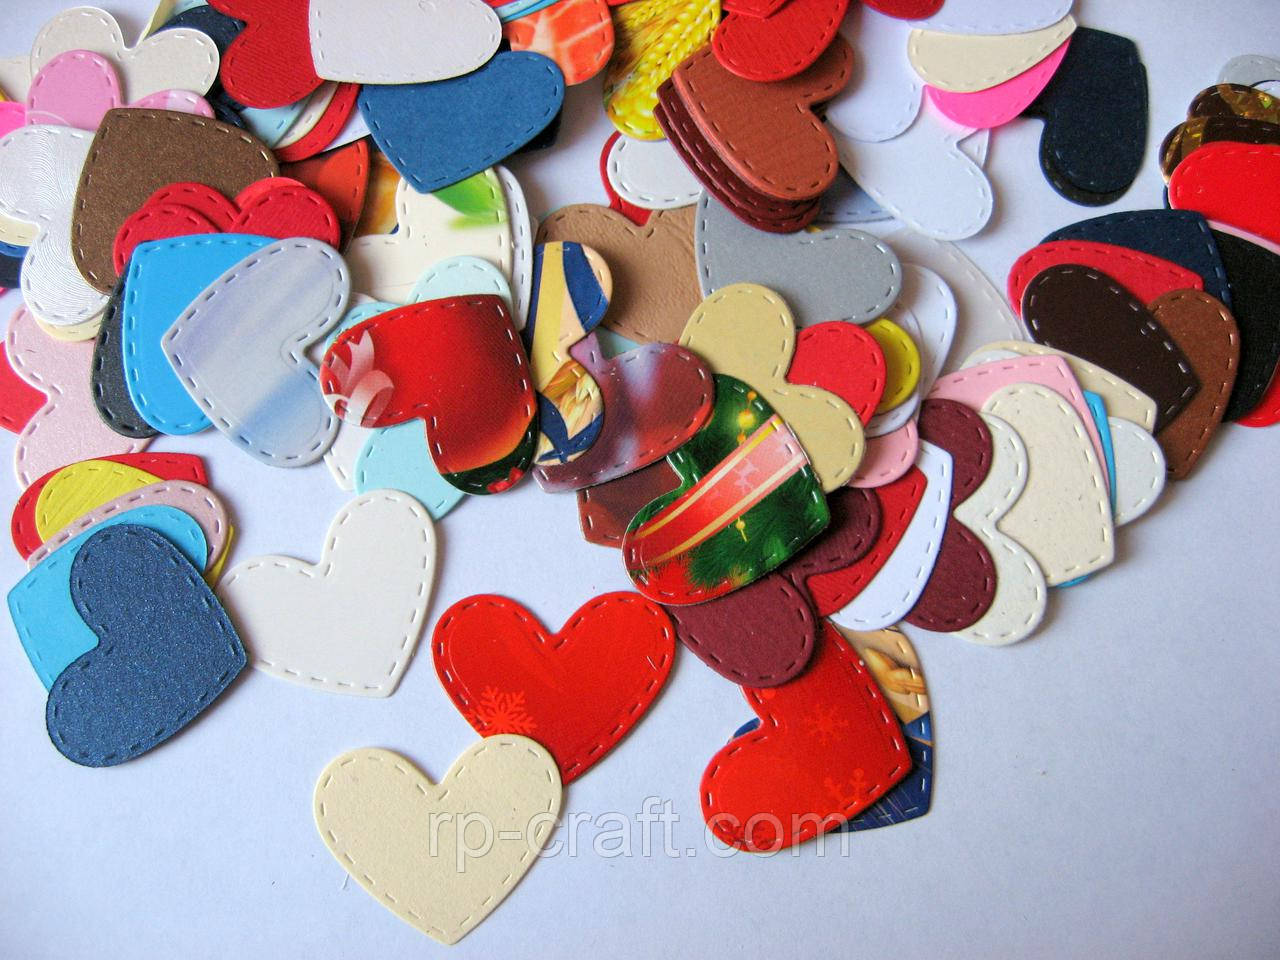 Набір вирубування з паперу та картону. Серце з рядком, 30х35 мм, 20 штук, мікс